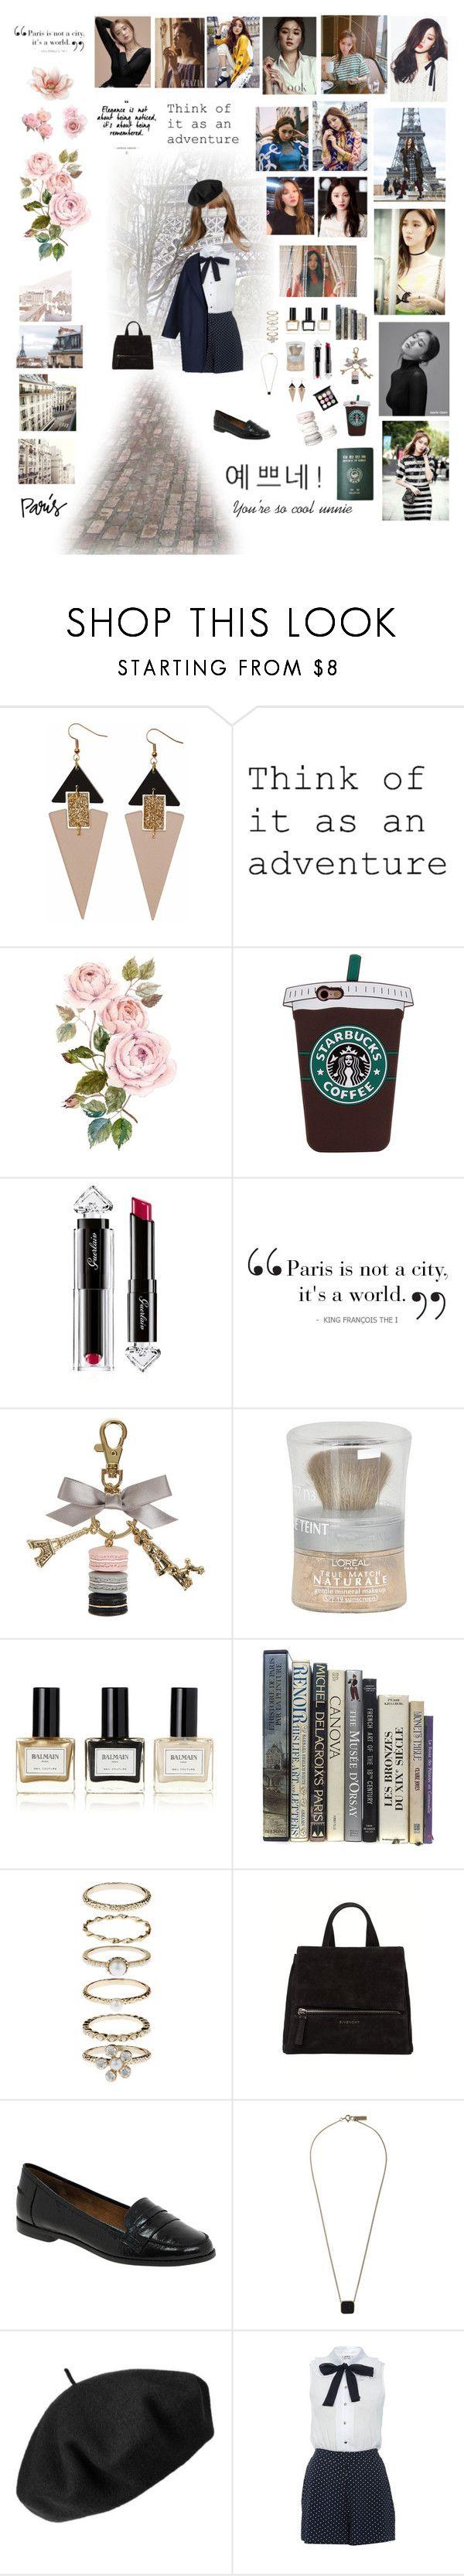 """Paris w/ Lee Sung Kyung"" by marktuan7 ❤ liked on Polyvore featuring GET LOST, twenty2, Toolally, Passport, Guerlain, Assouline Publishing, Ladurée, L'Oréal Paris, Balmain and Accessorize"